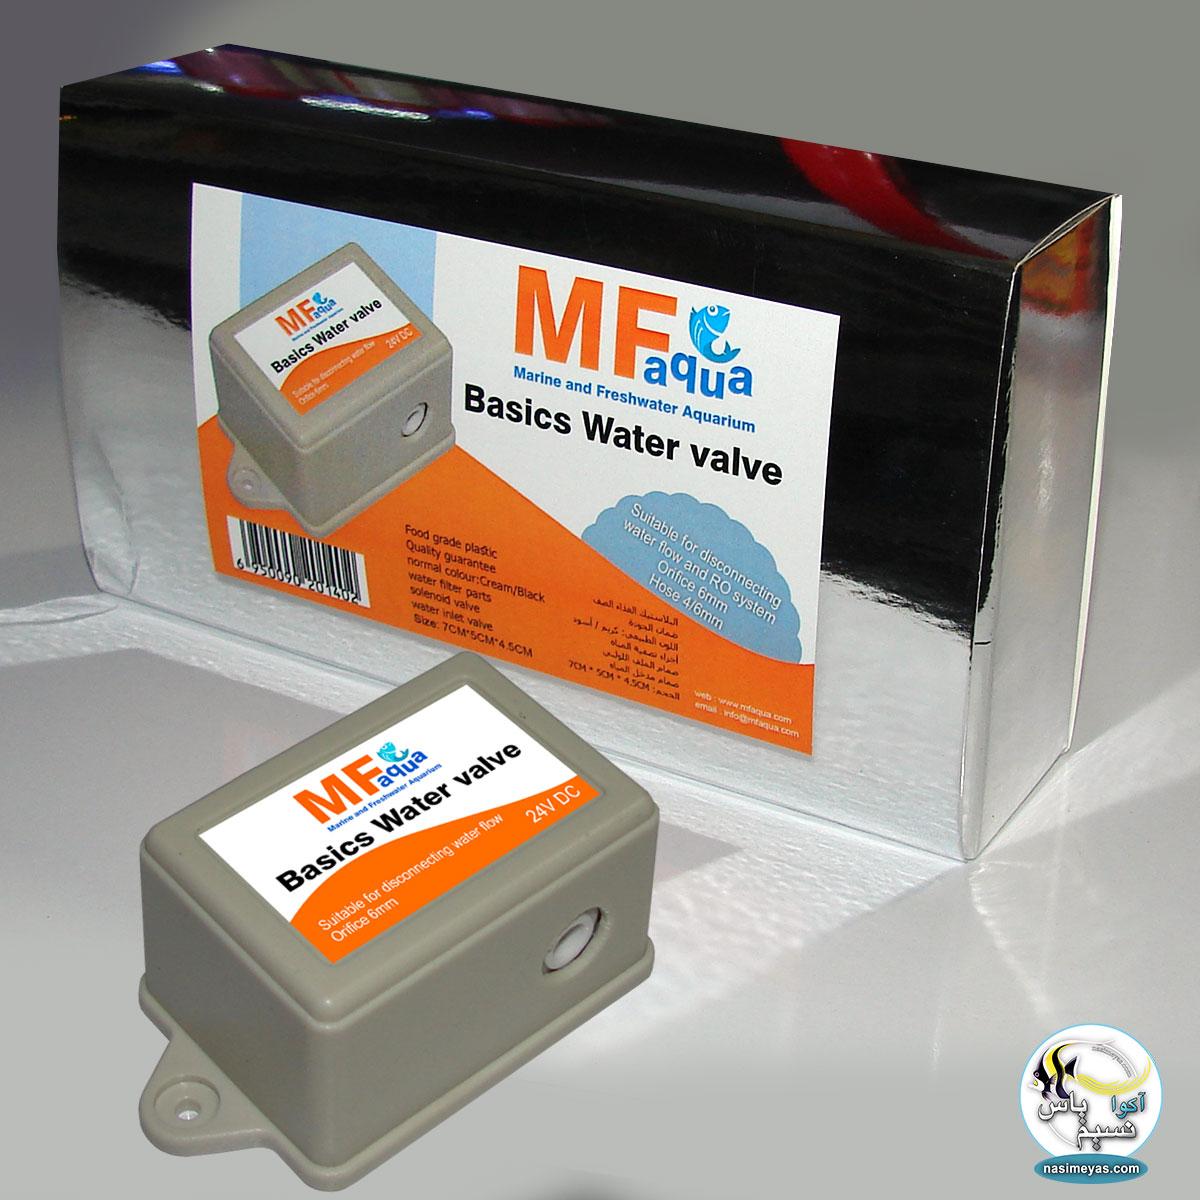 MF aqua Basics Water Valve